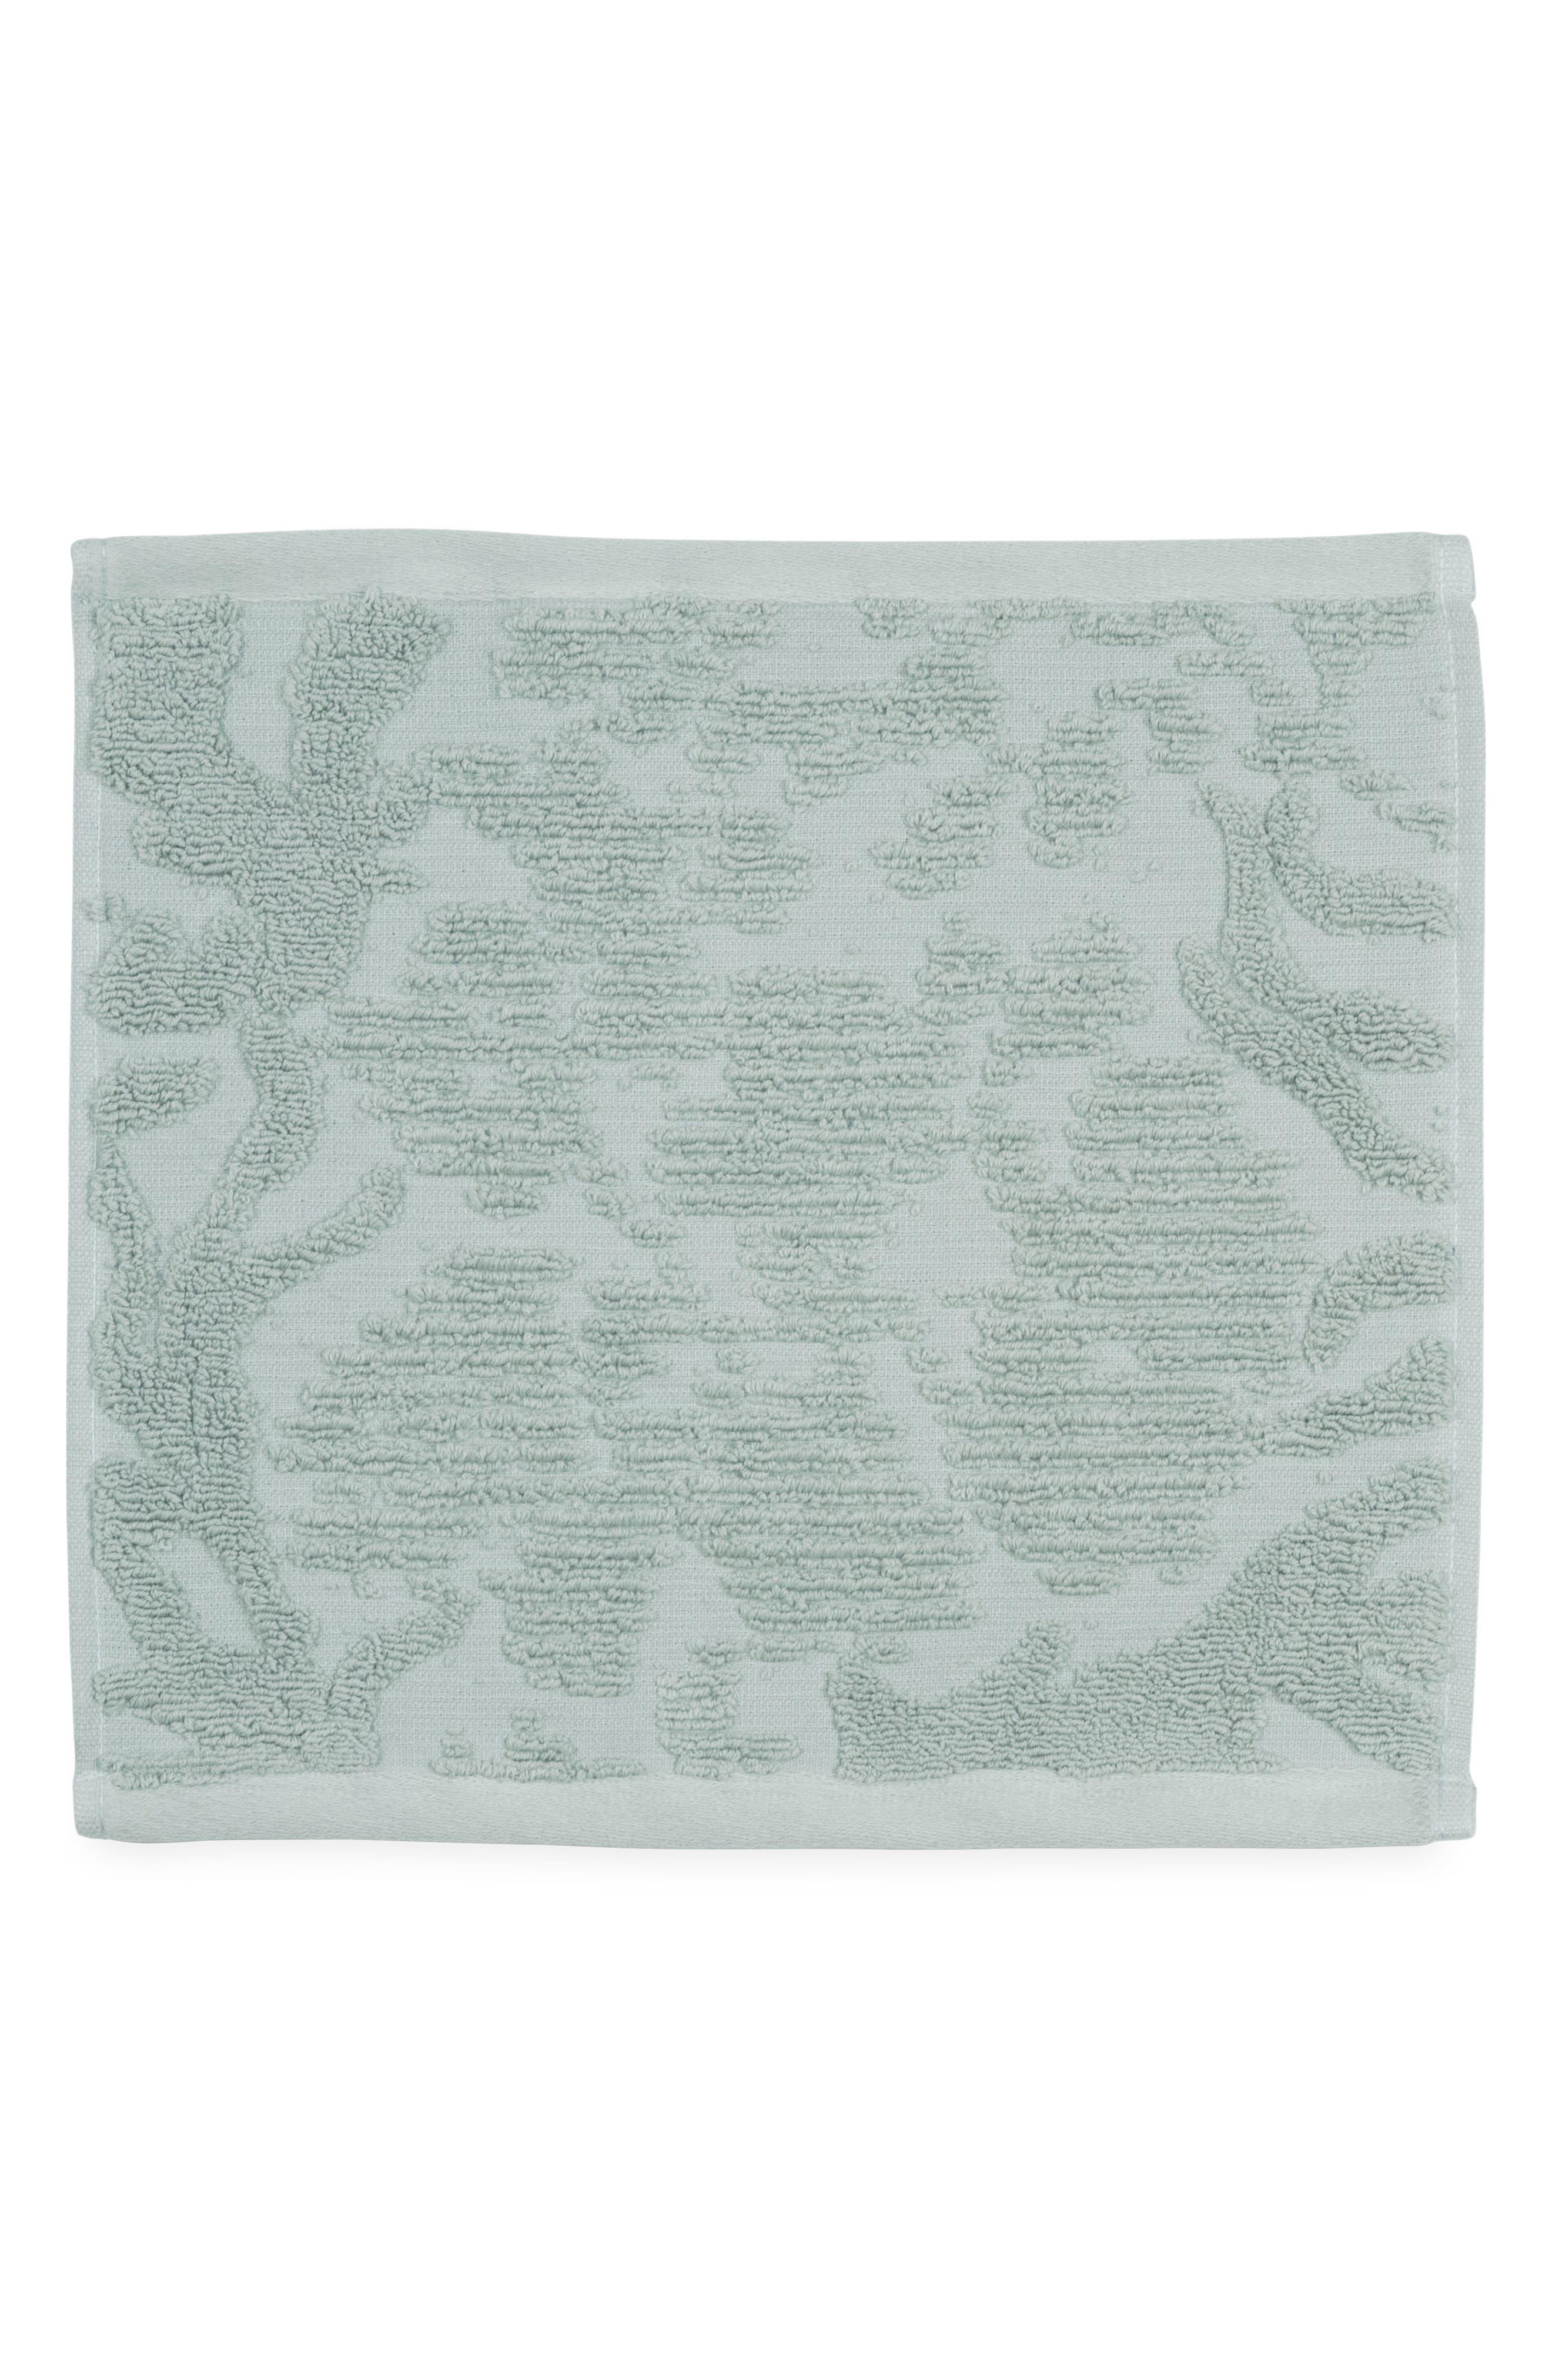 Ocean Reef Washcloth,                             Main thumbnail 1, color,                             SEAFOAM